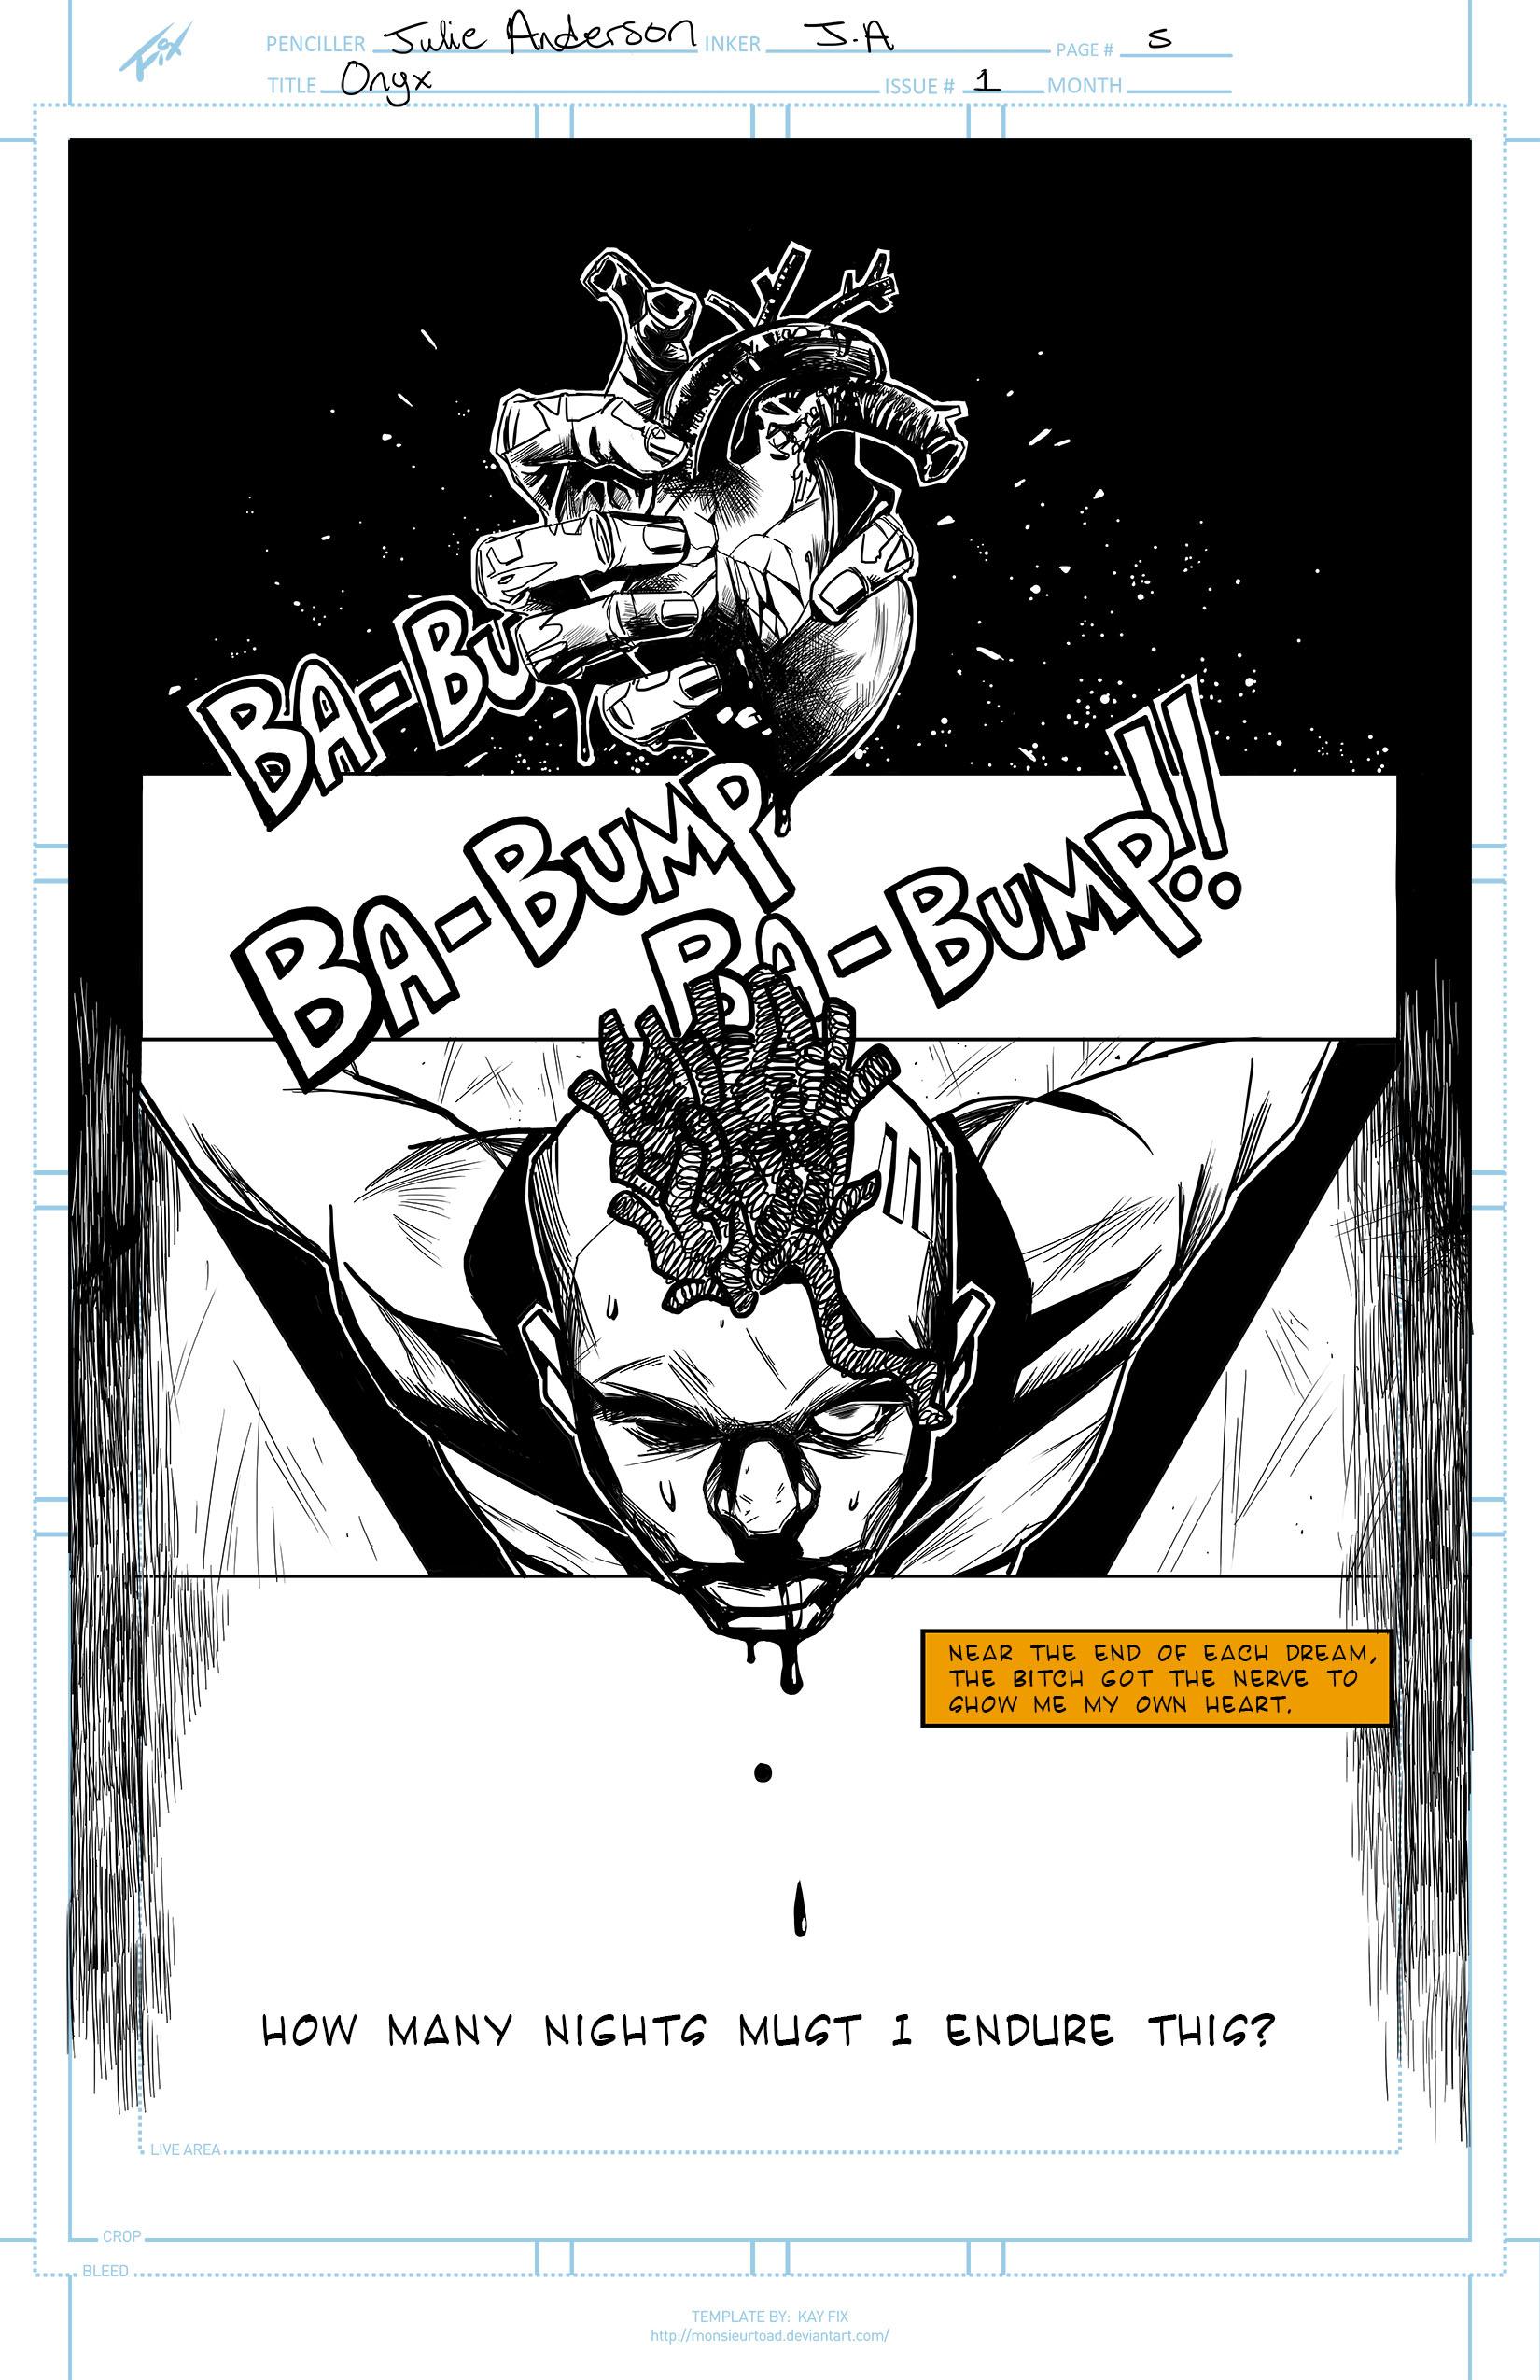 Onyx pg. 5